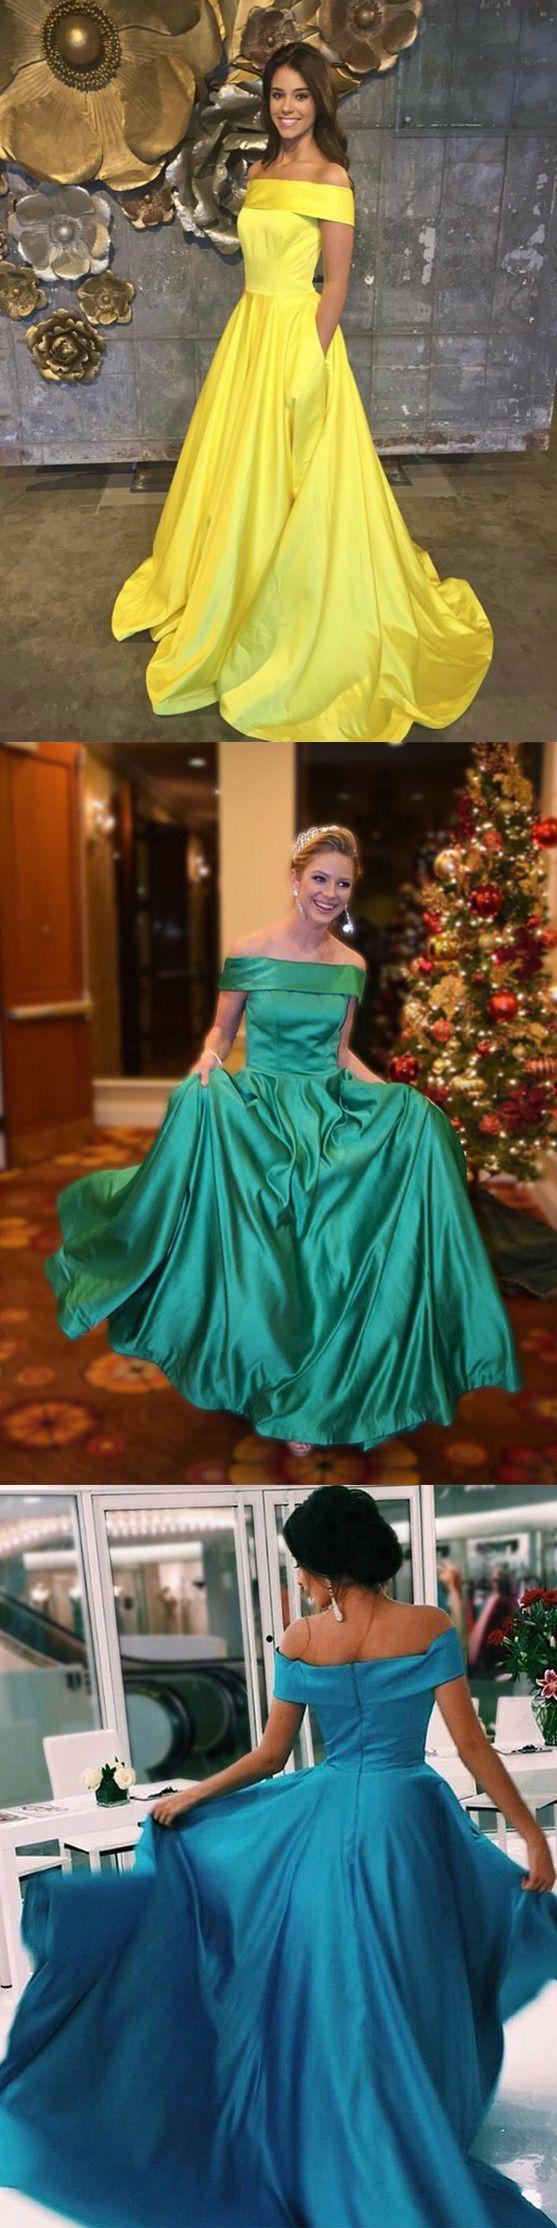 1e15ab0c7c2 Yellow Prom Dresses 2019